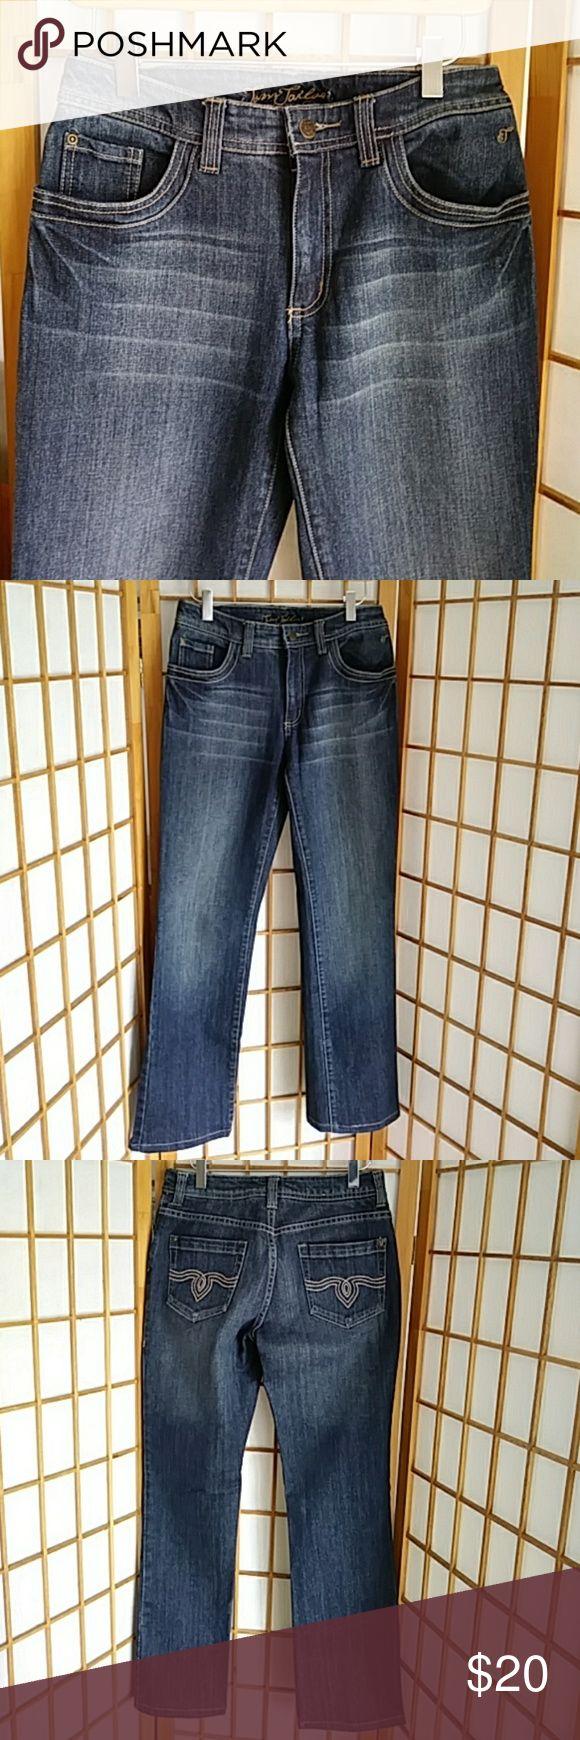 "Tom Taylor denim jeans Super nice jeans in good clean condition, 30"" inseam Tom Taylor Jeans Boyfriend"